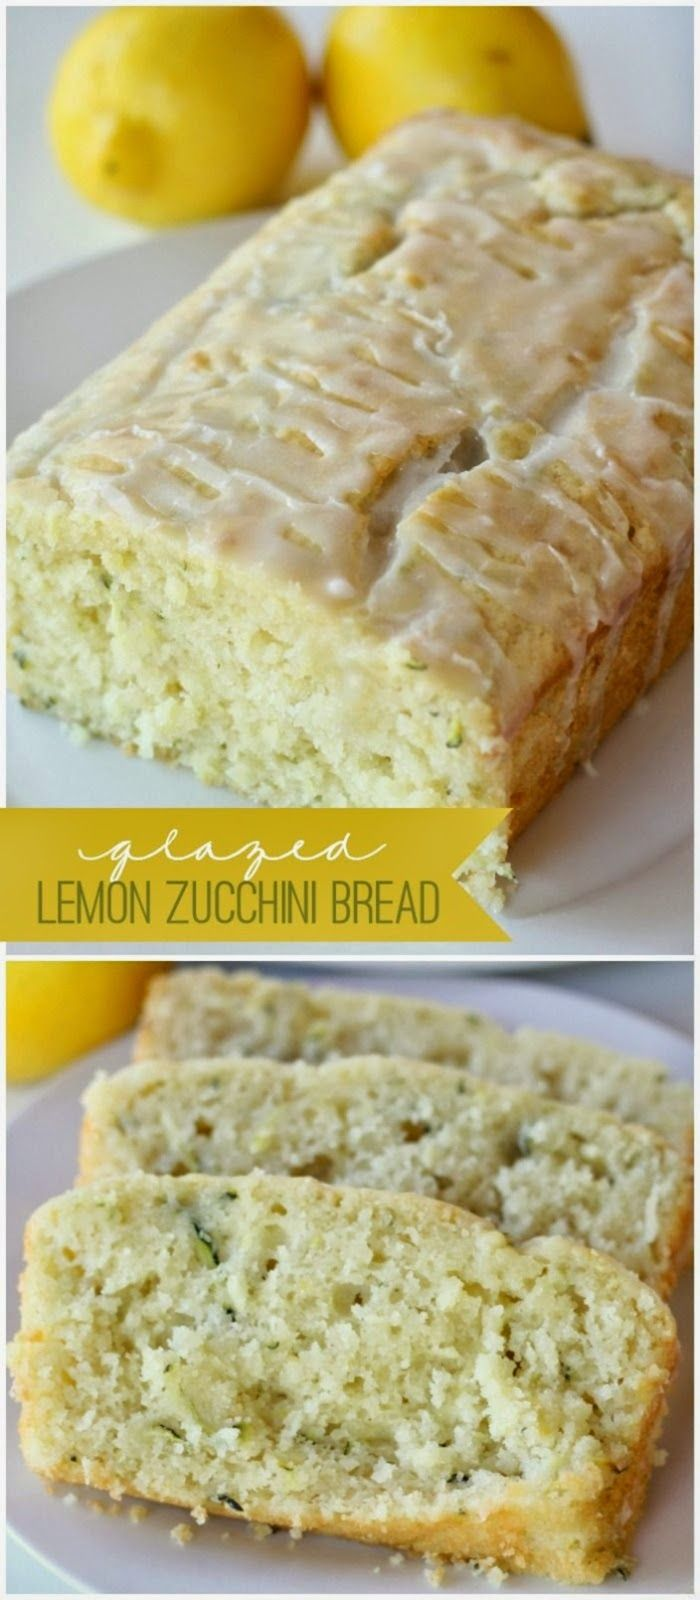 food and drink: Glazed Lemon Zucchini Bread